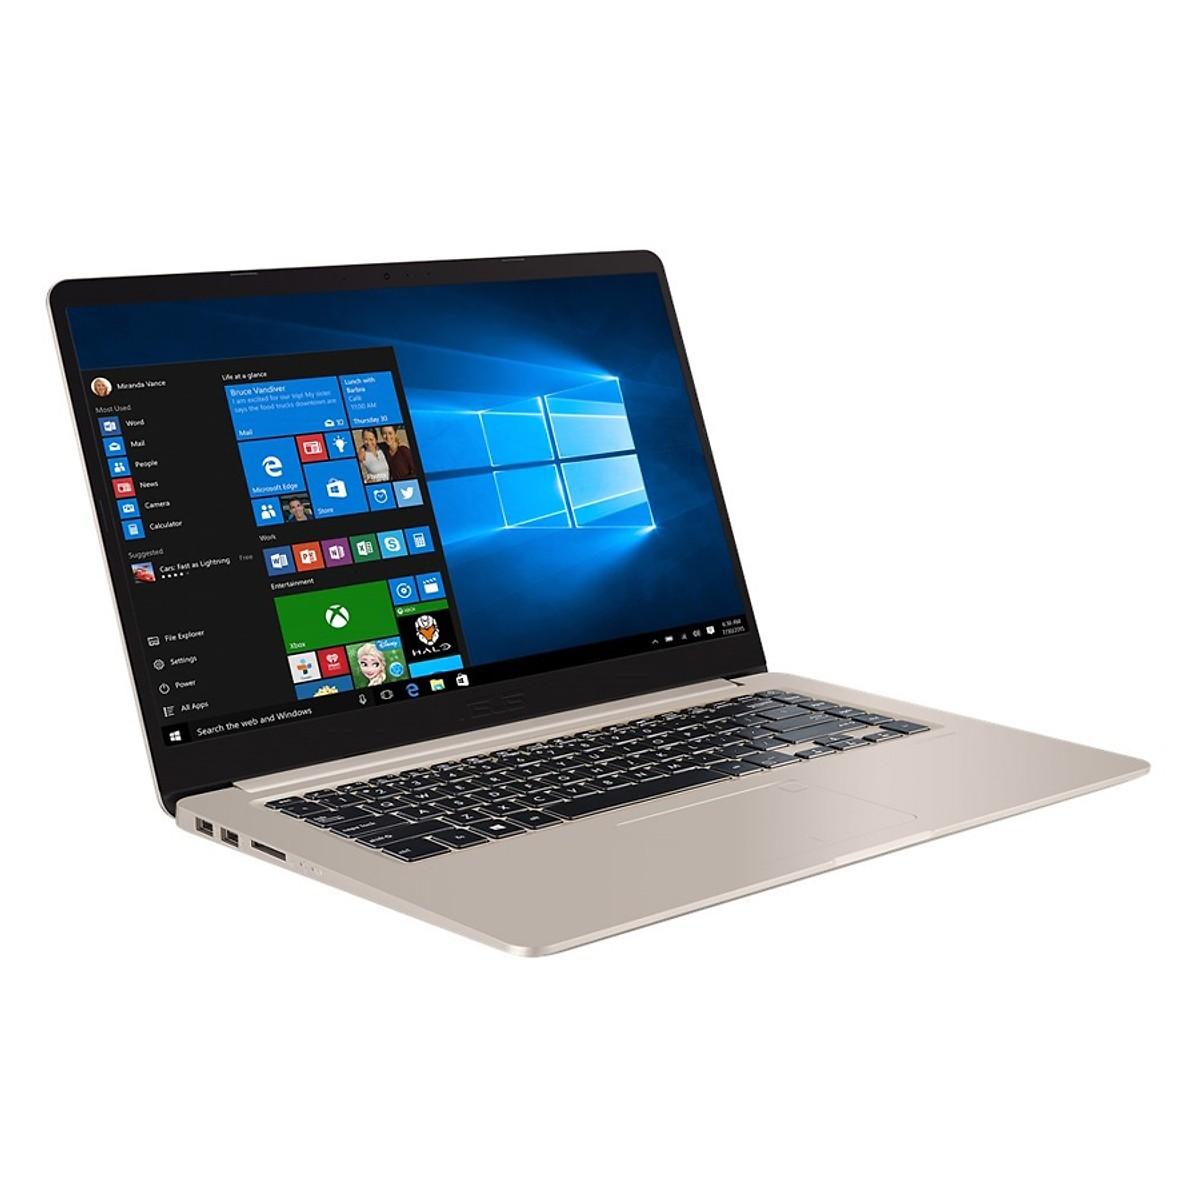 Asus   Máy tính xách tay - Laptop  Laptop Asus Vivobook S14 S430FA-EB071T Core i3-8145U/ Win10 (14